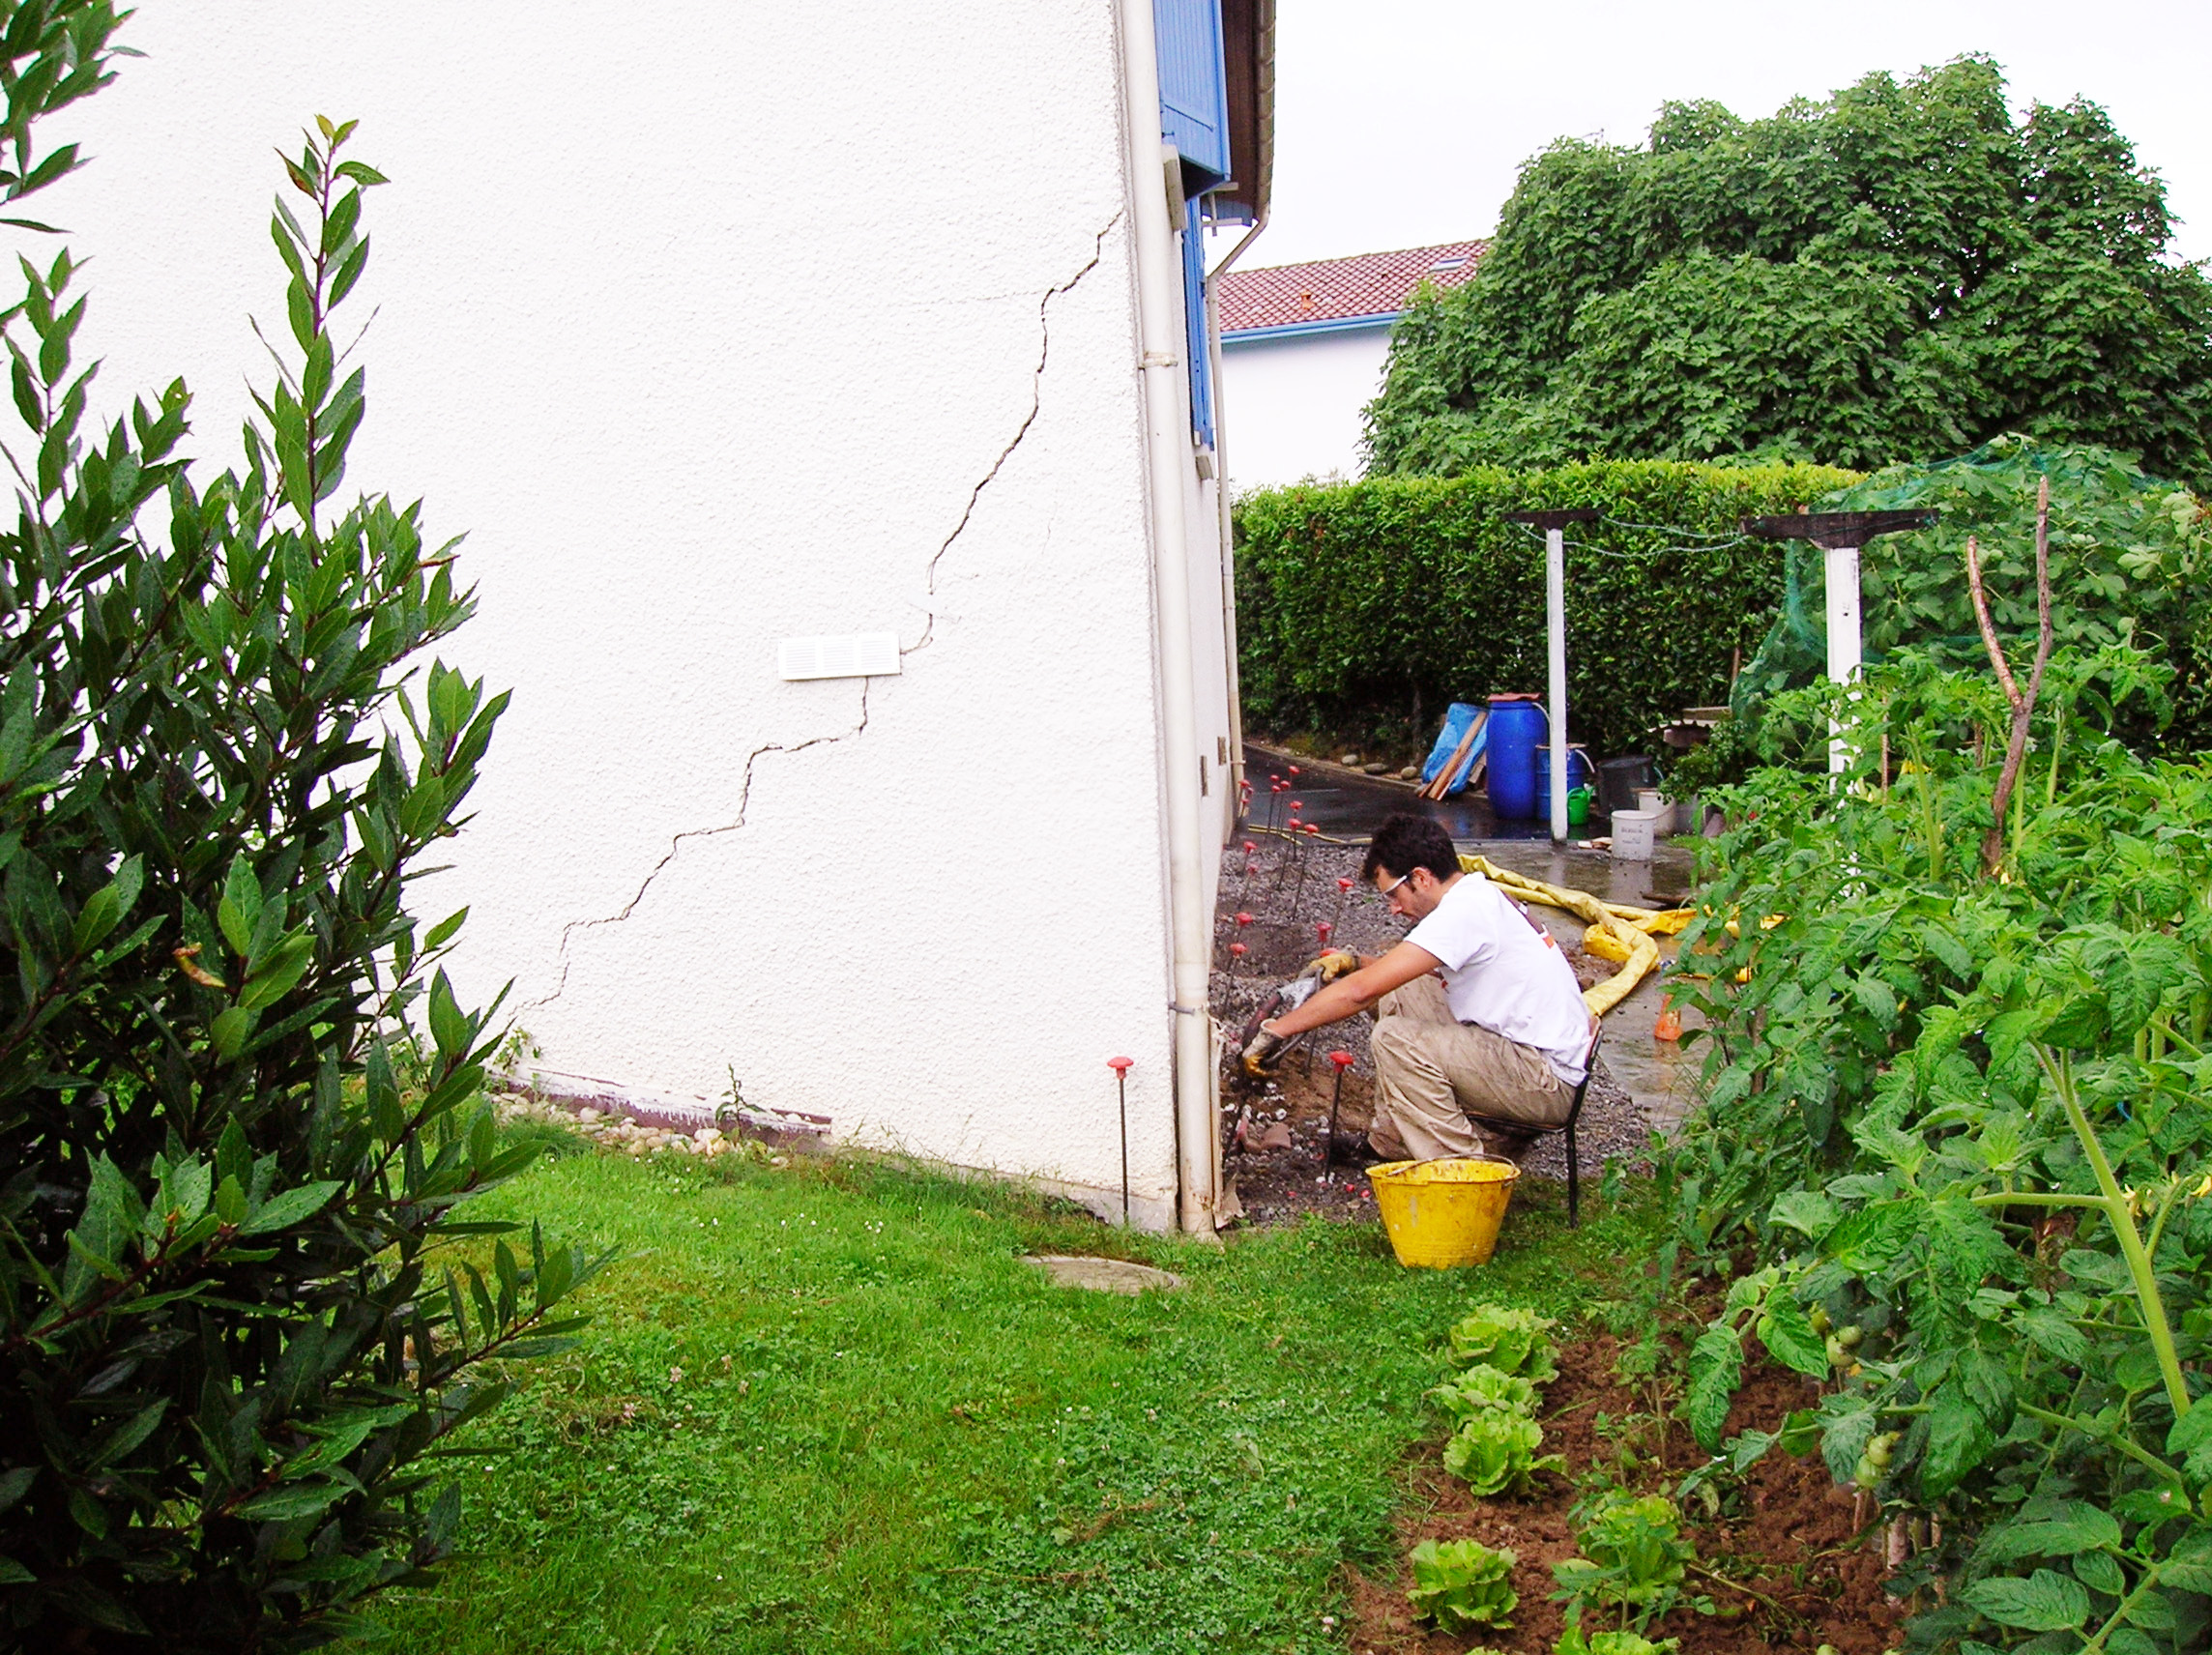 photo intervention uretek maison secheresse argile